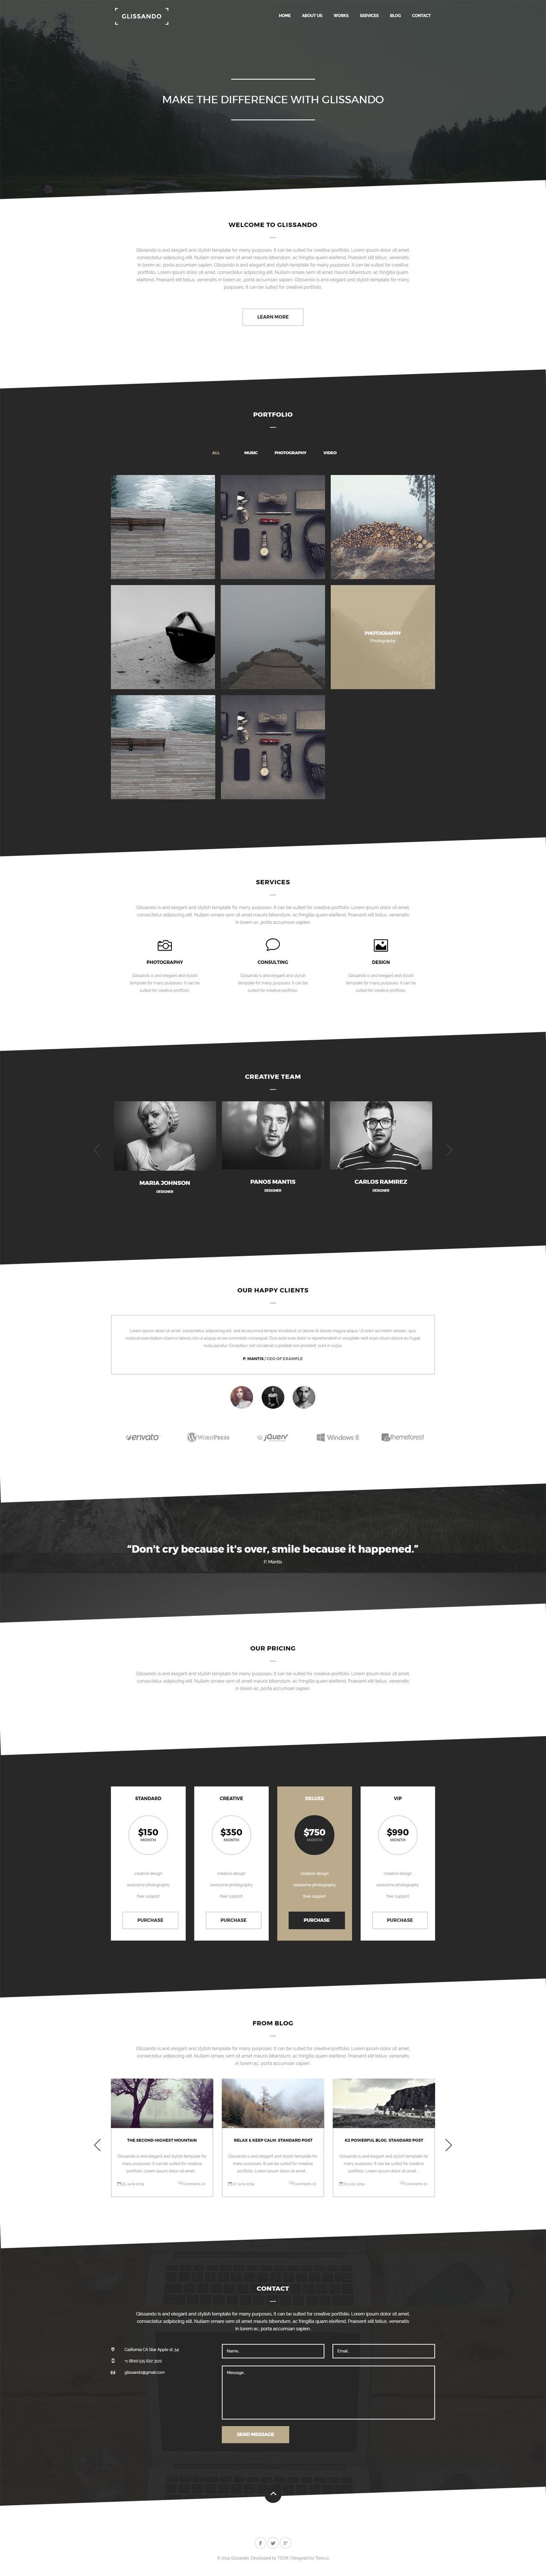 Joomla 创意模板 Glissando